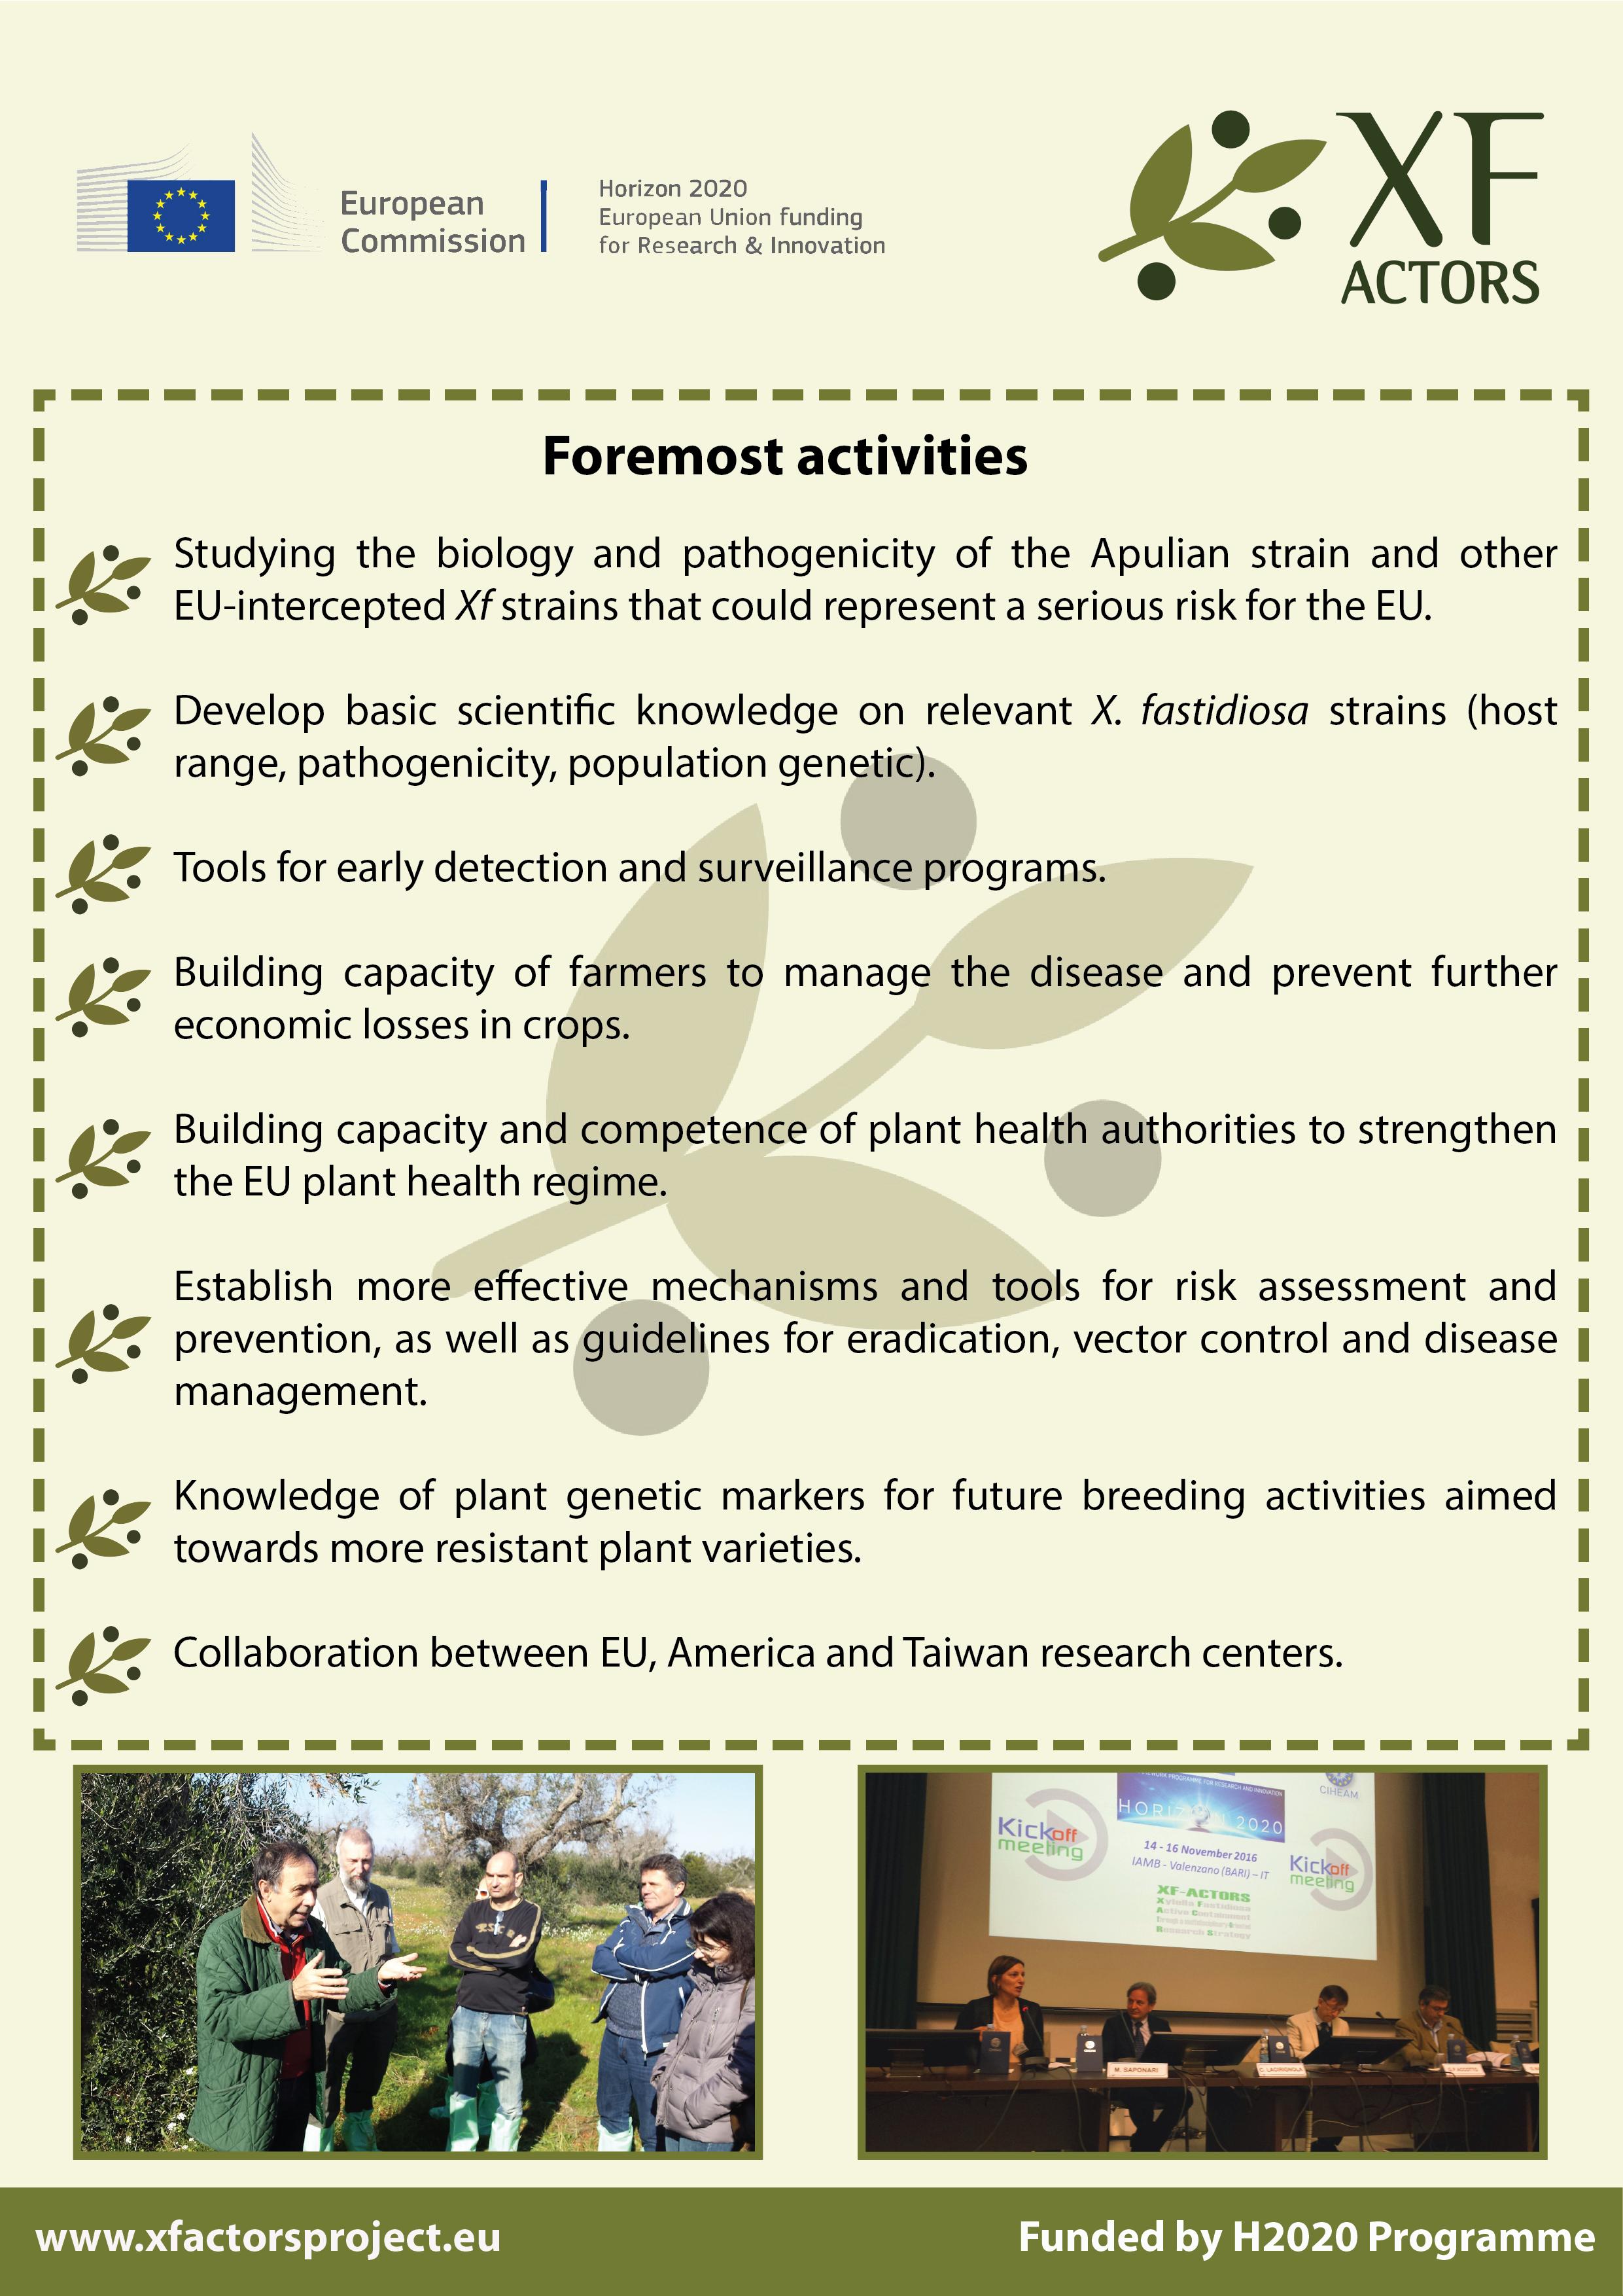 Factsheet 3